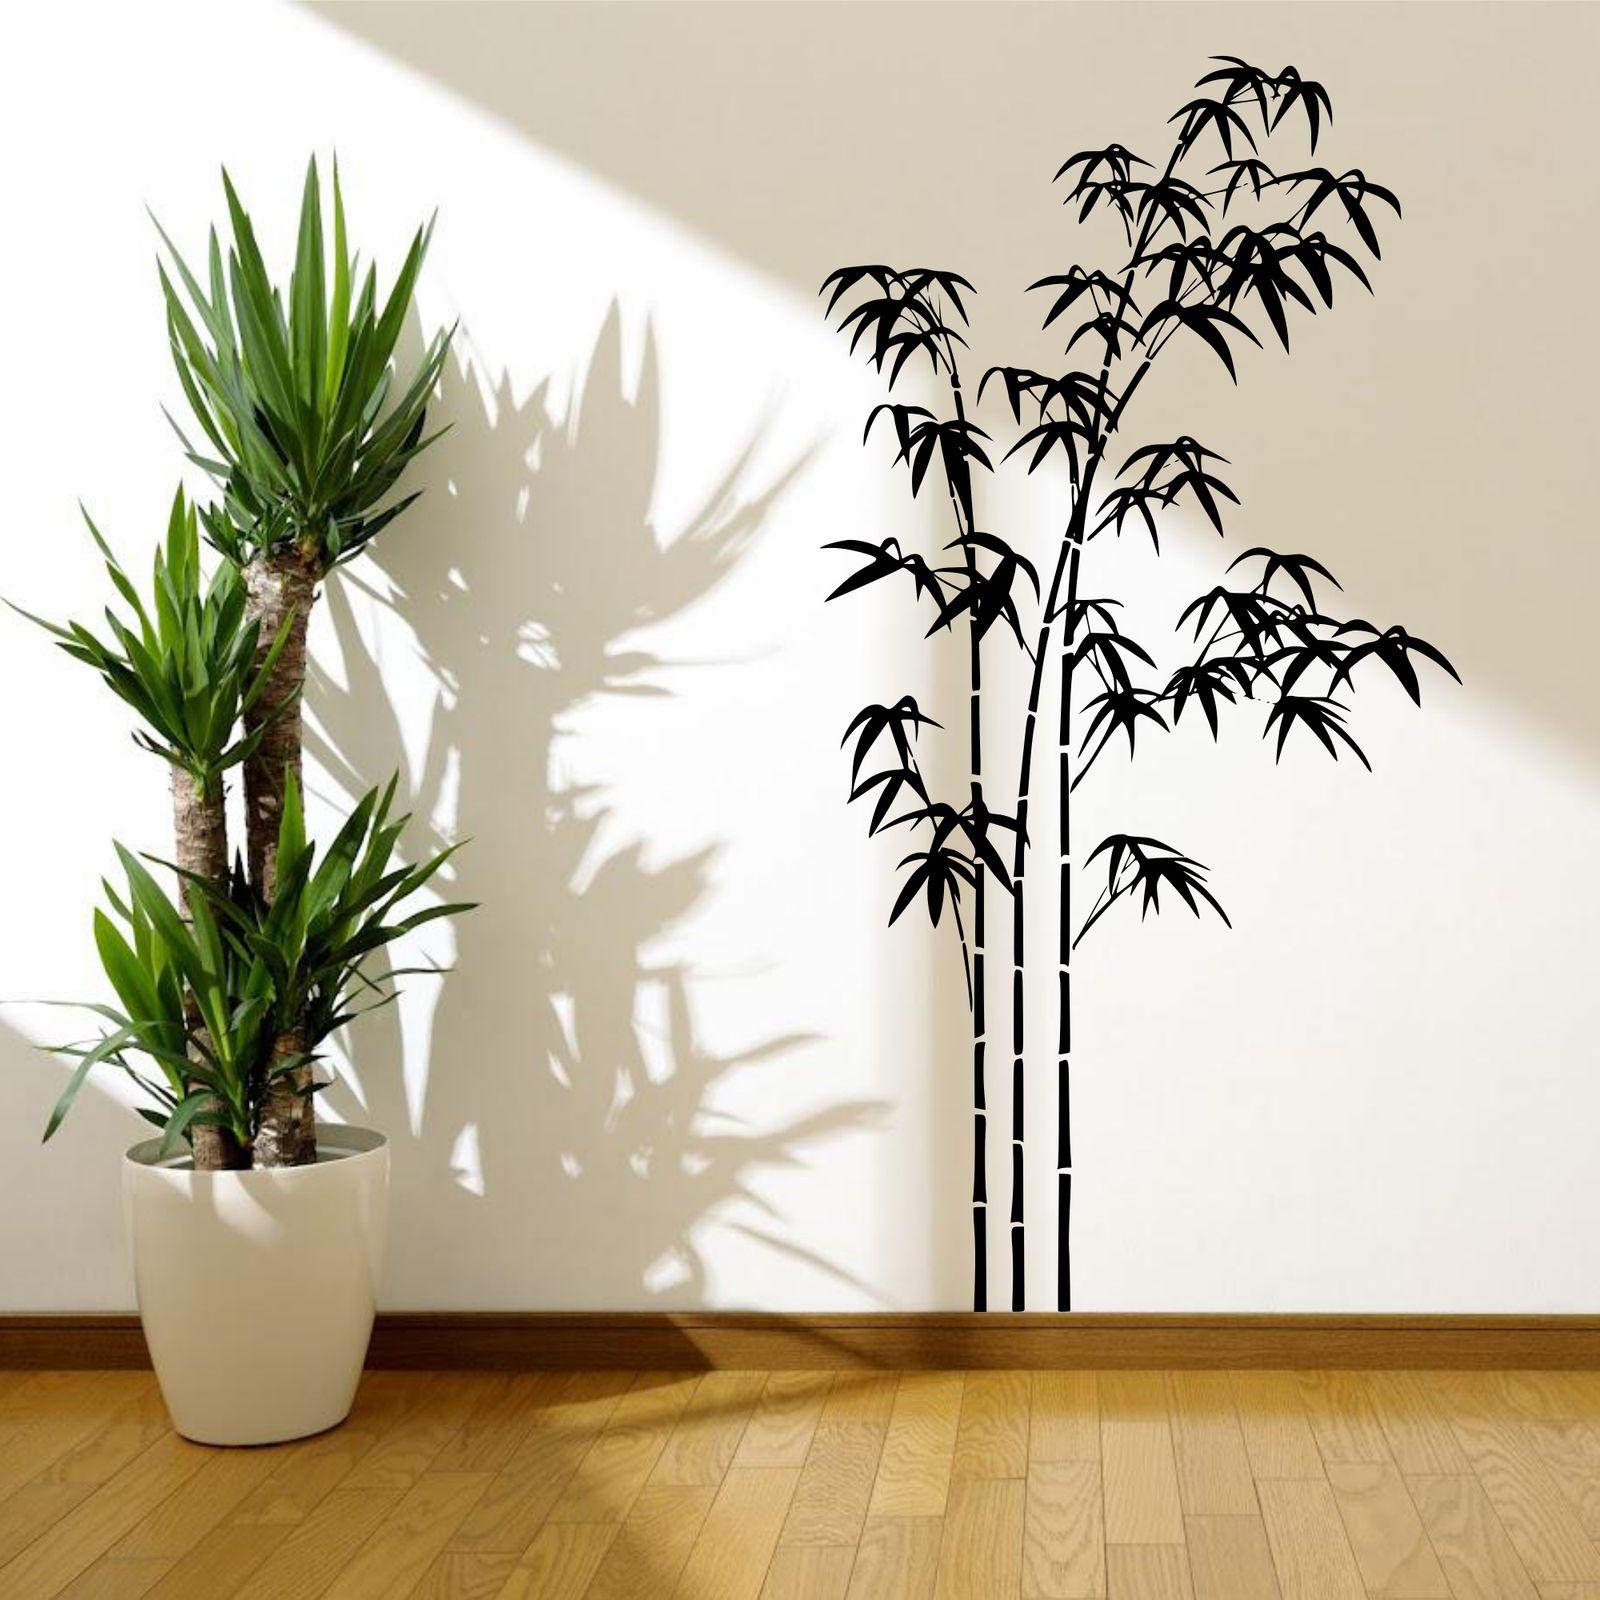 bambus baum gras wild dschungel wand sticker aufkleber. Black Bedroom Furniture Sets. Home Design Ideas